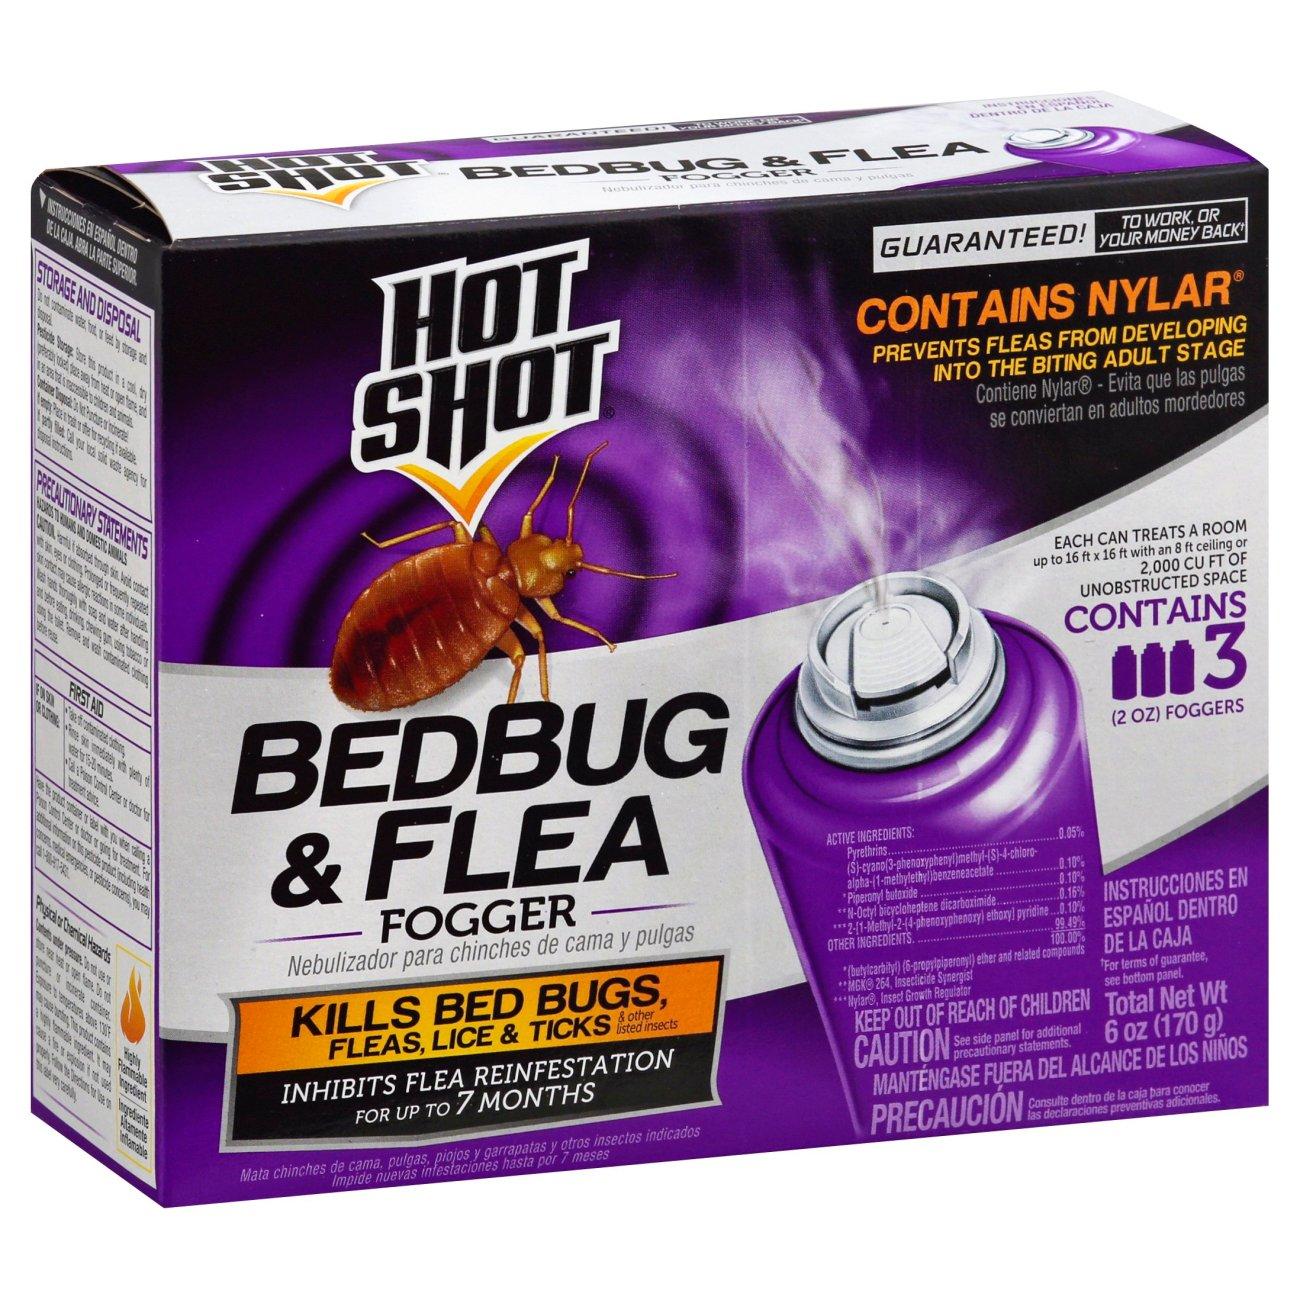 hot shot bedbug & flea fogger ‑ shop indoor at heb